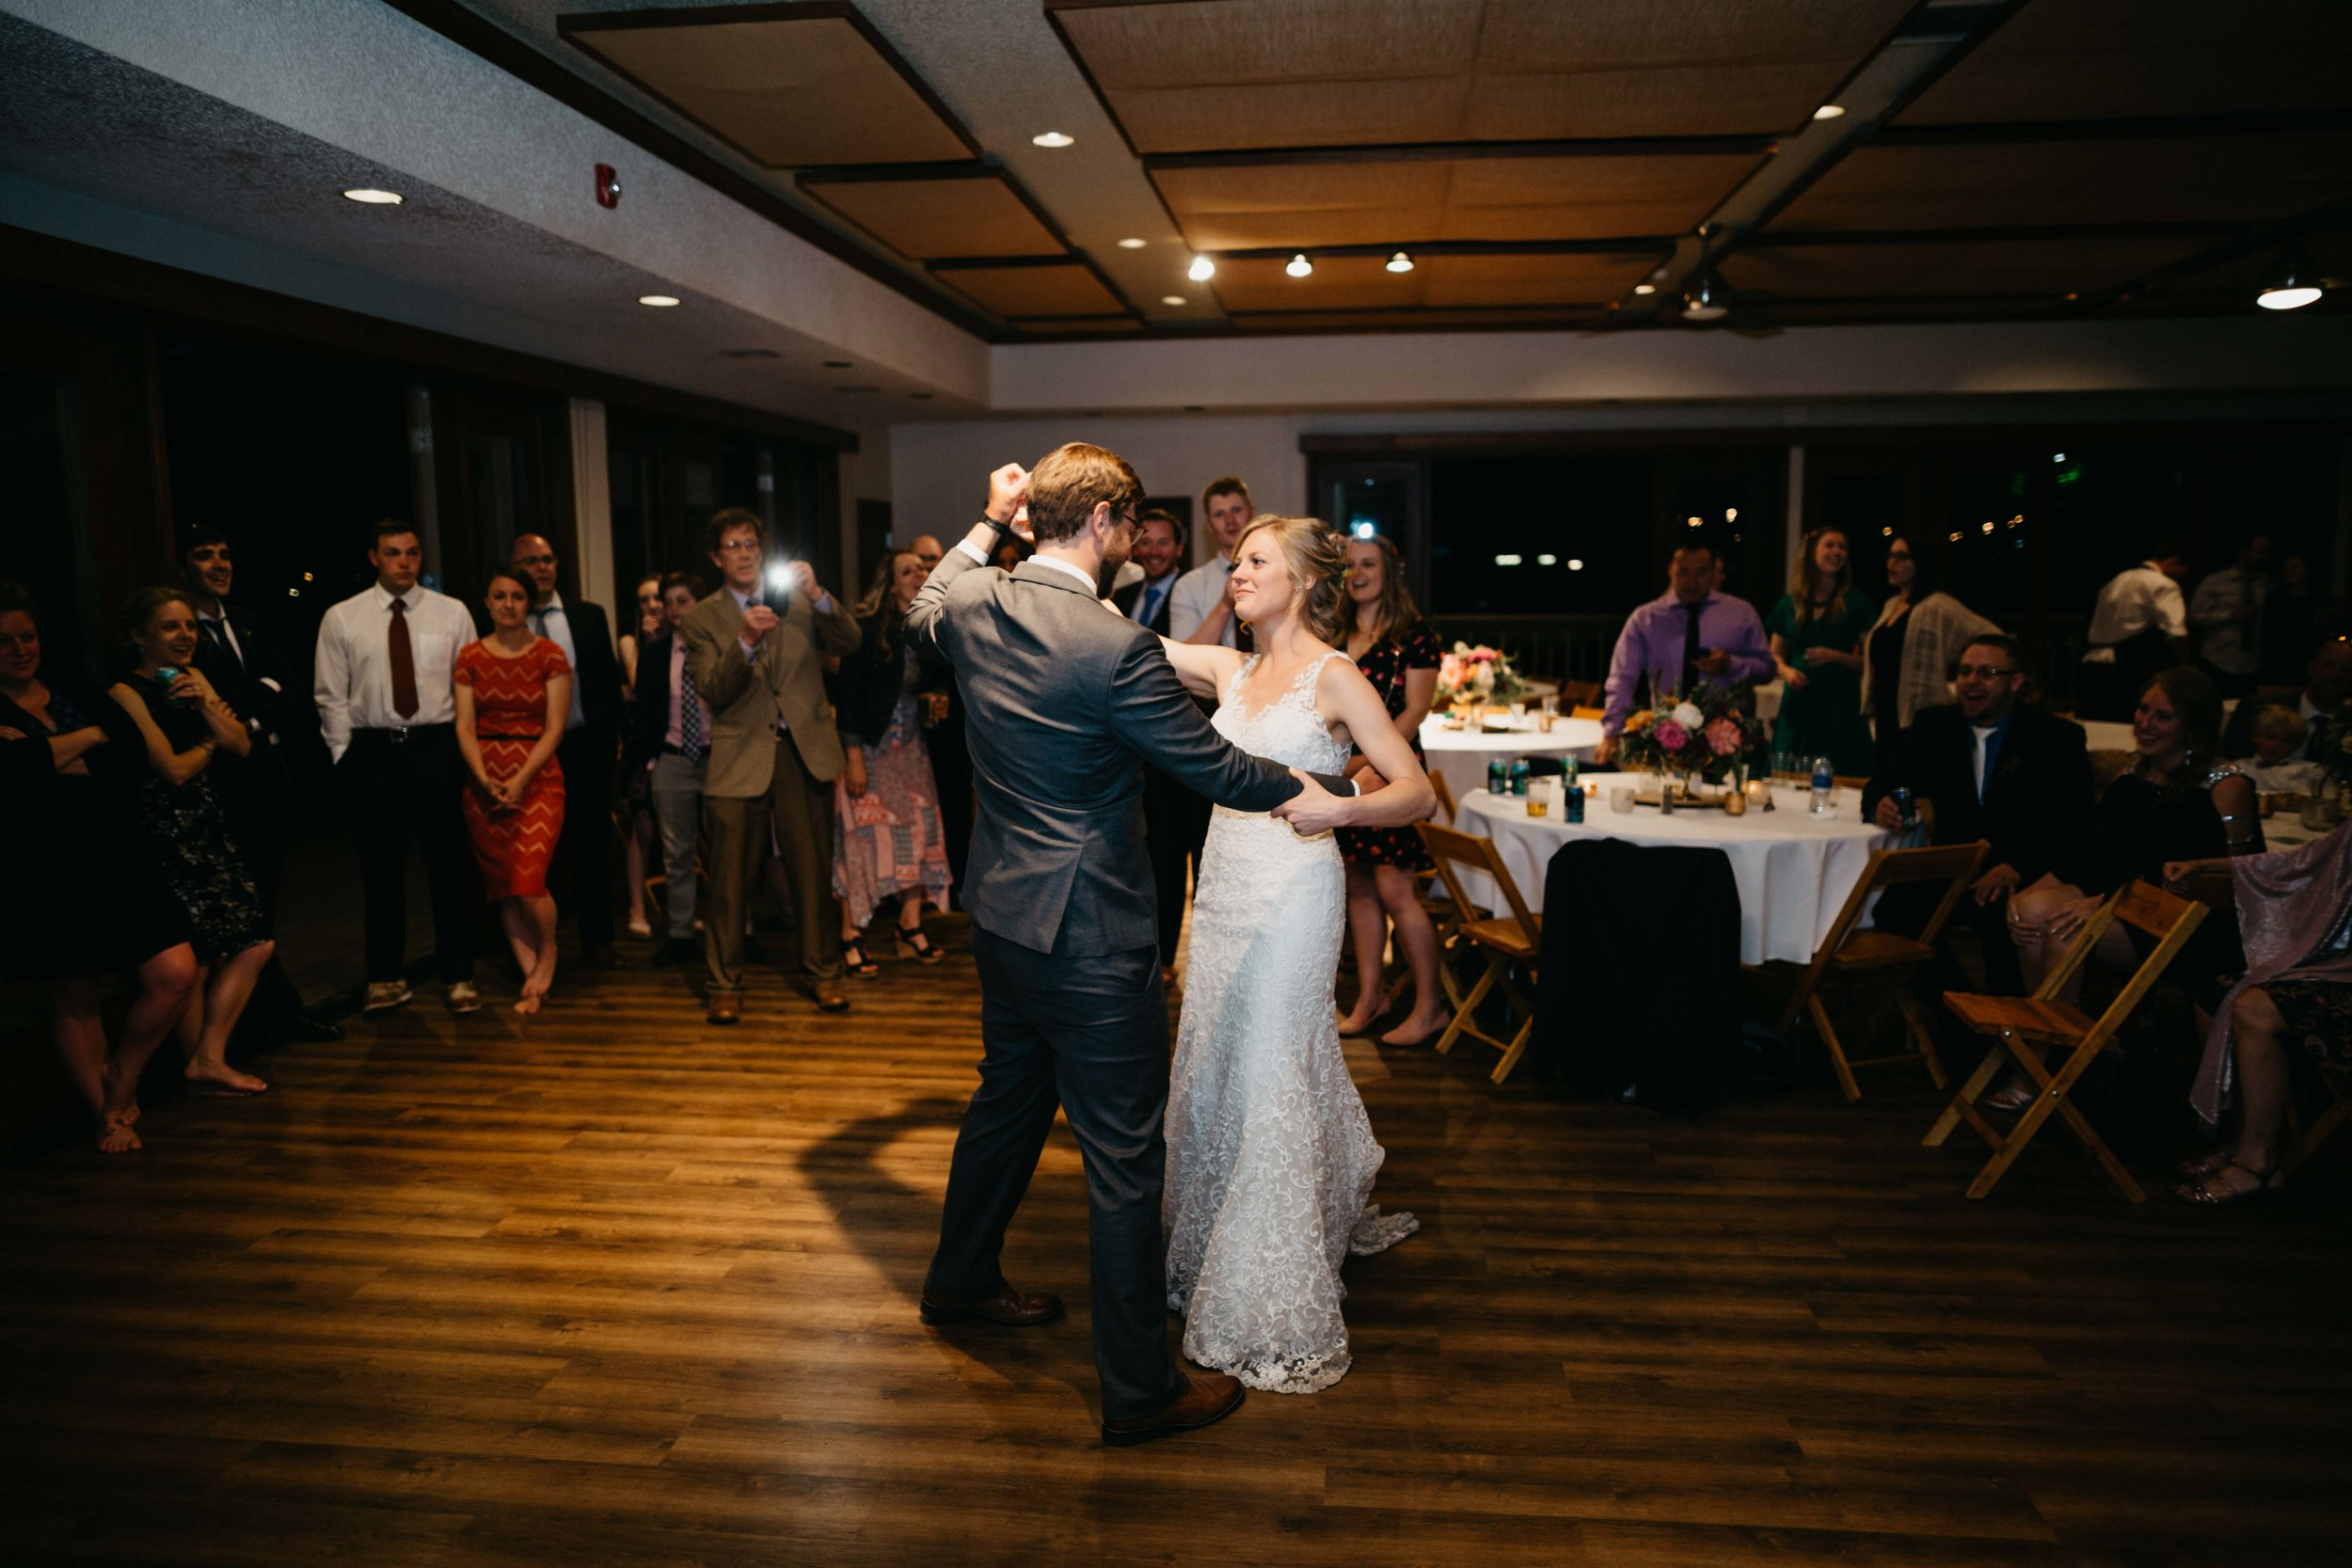 Colorado-Wedding-Photographer-103.jpg